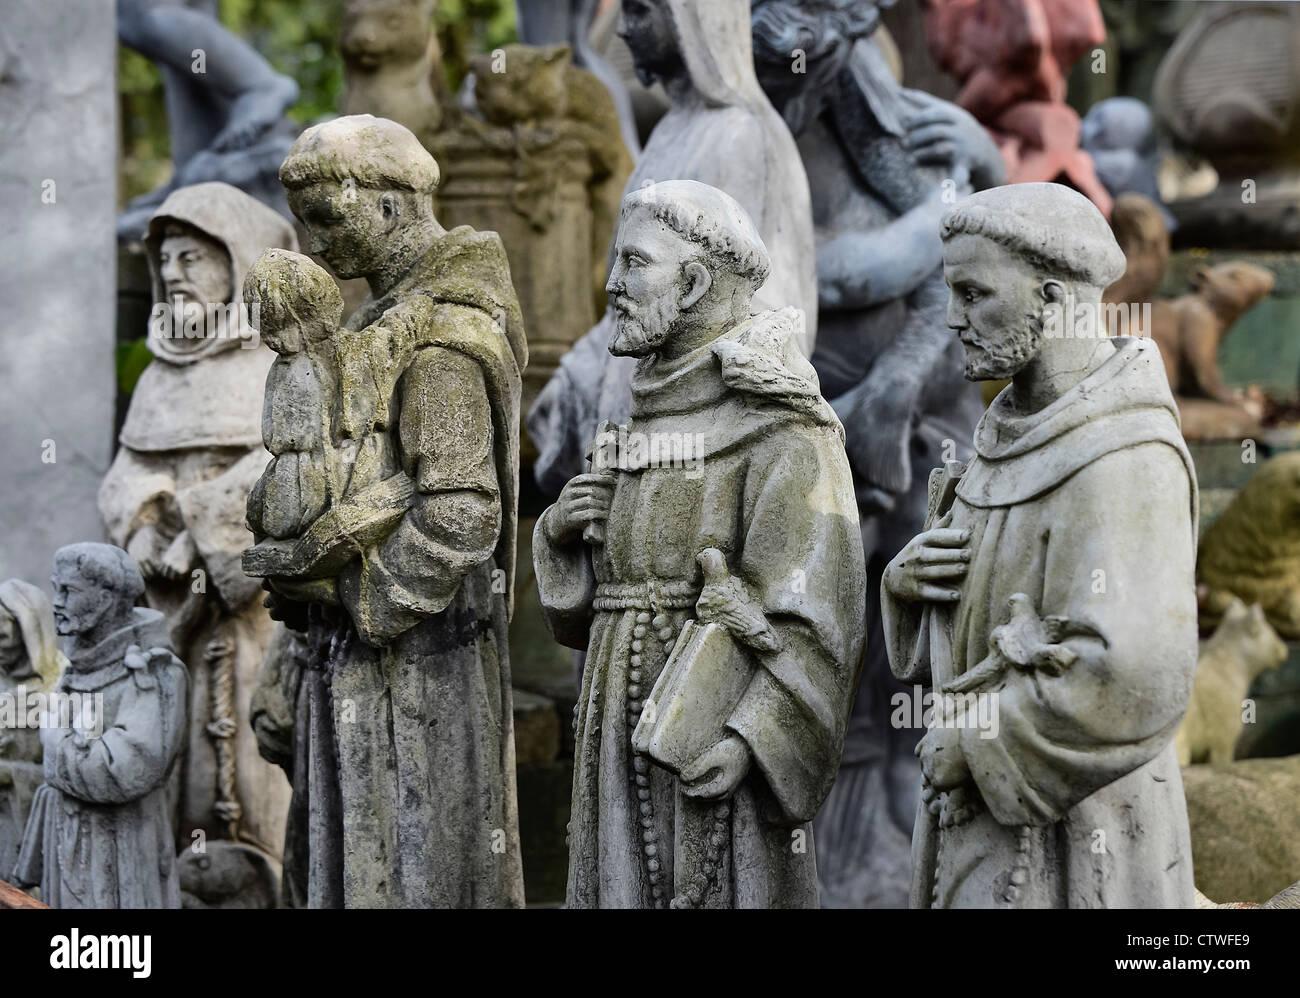 St Francis garden statuary. - Stock Image